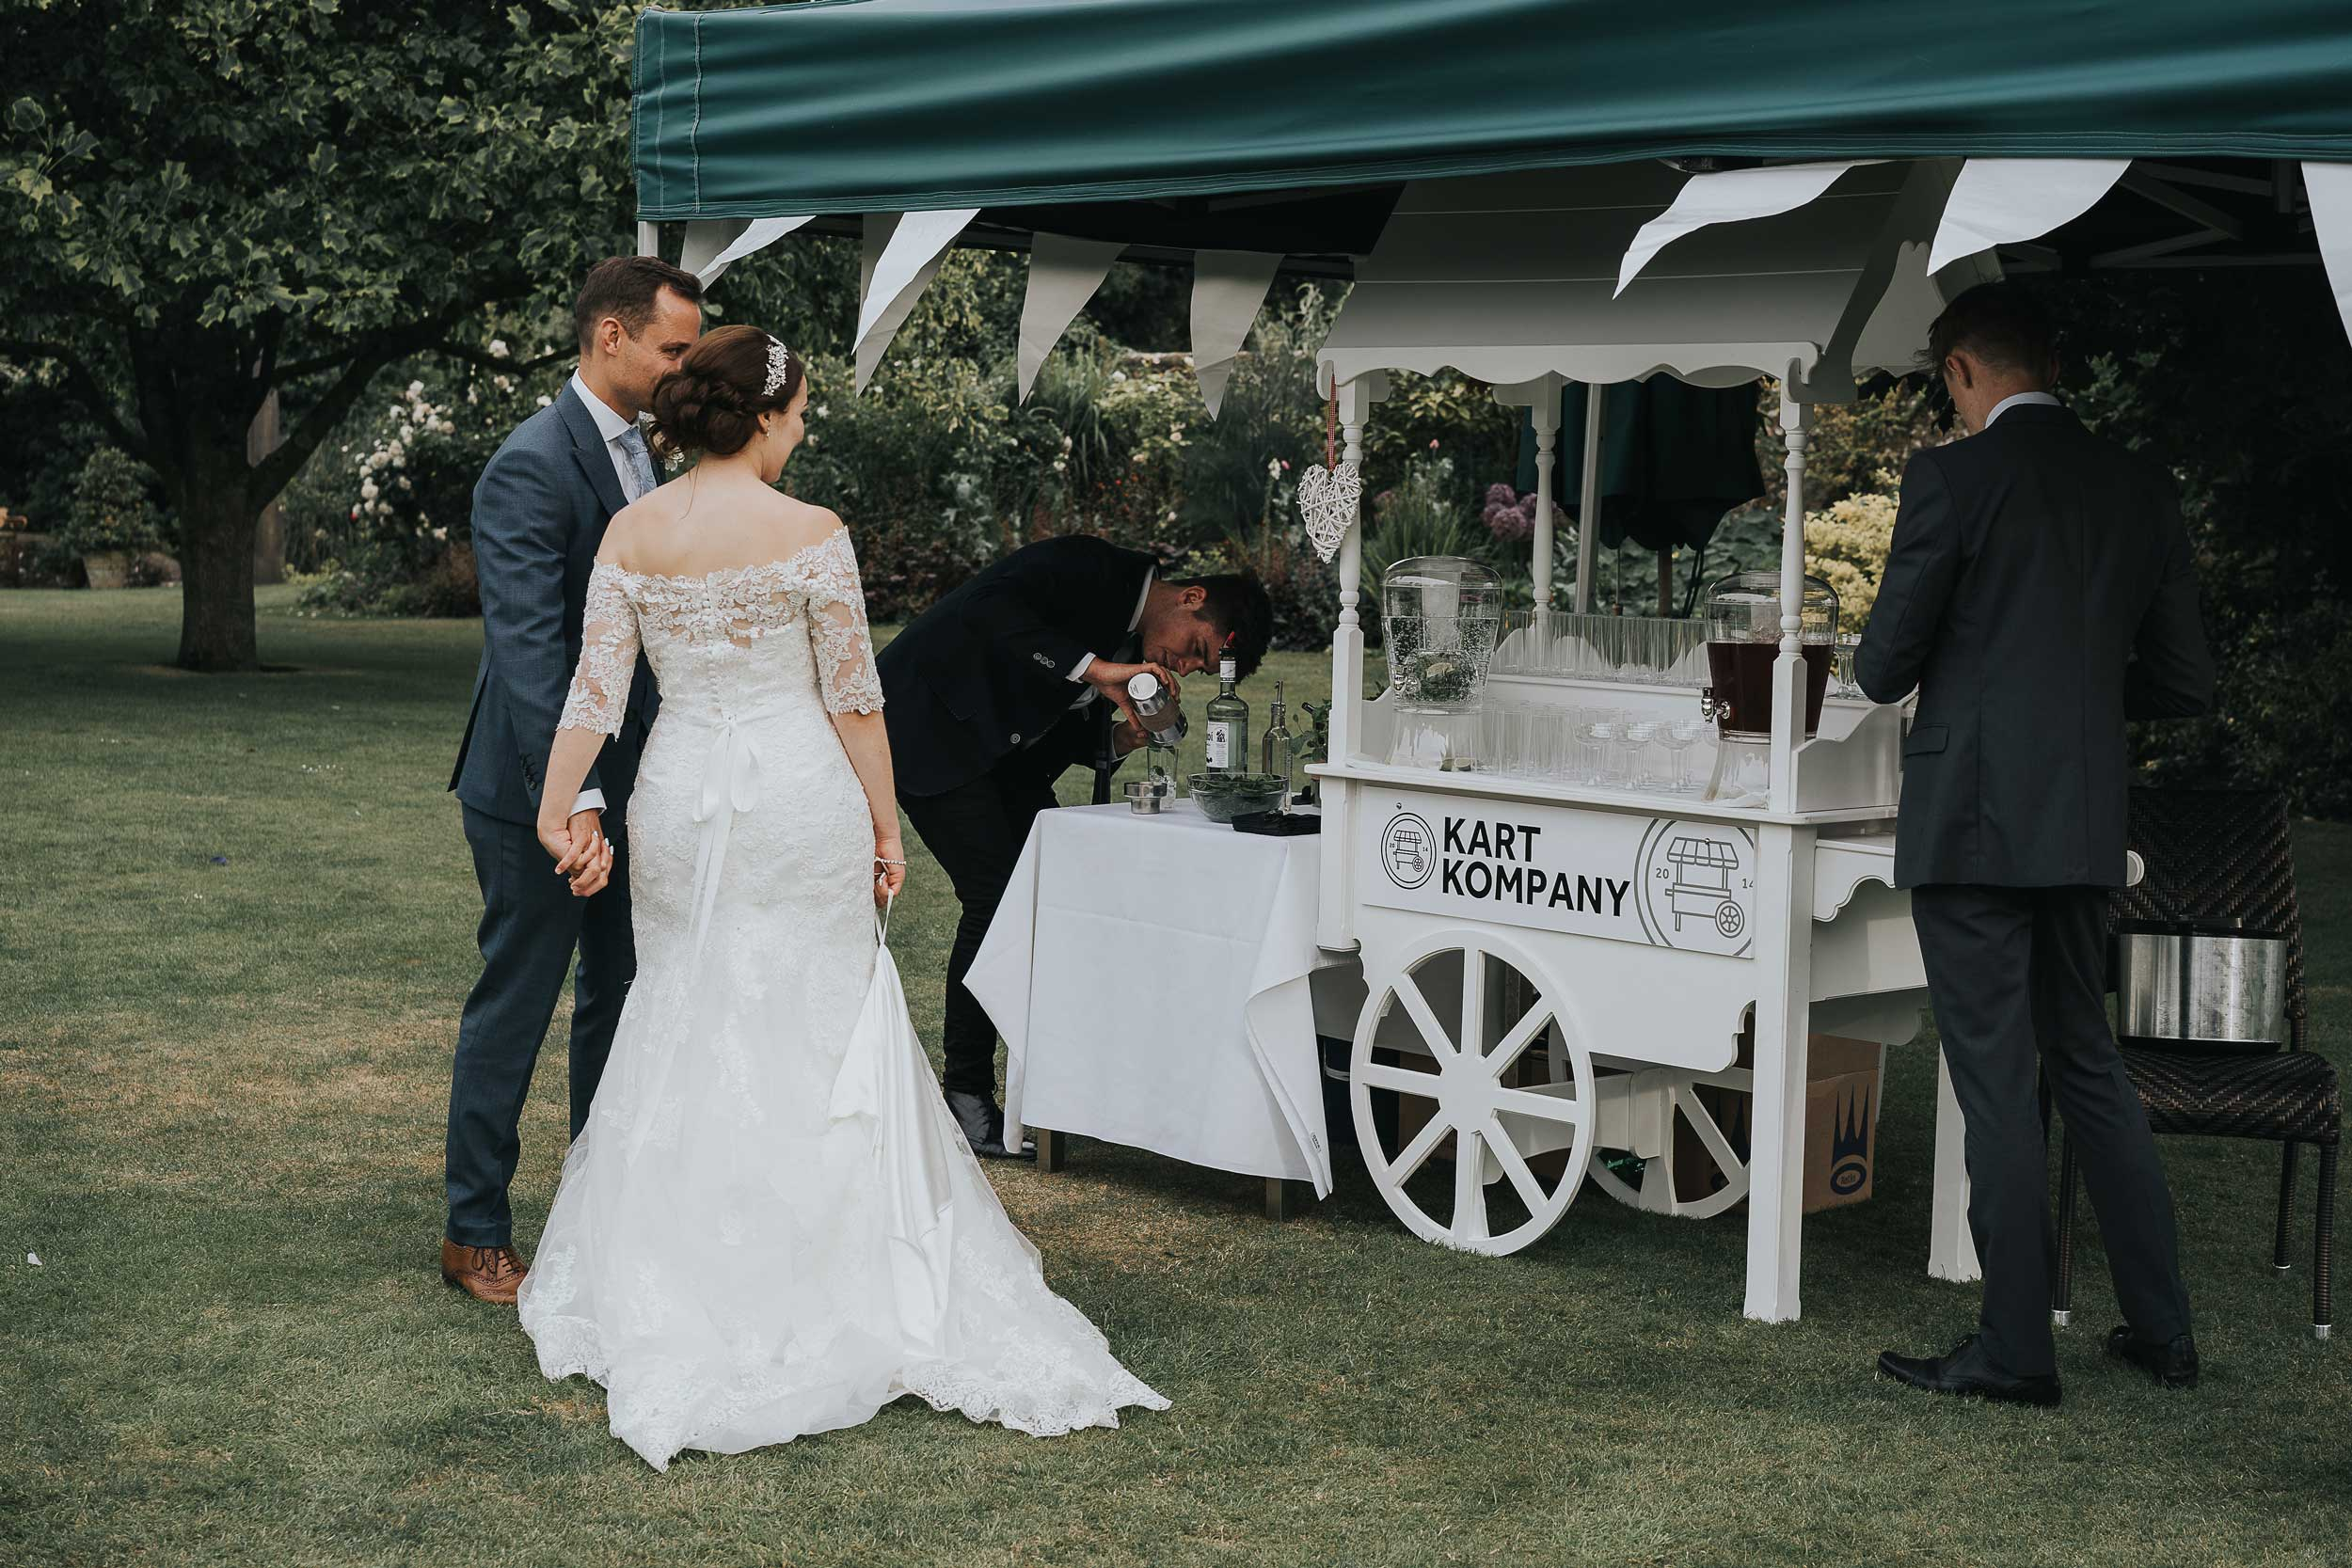 Wedding cocktail cart